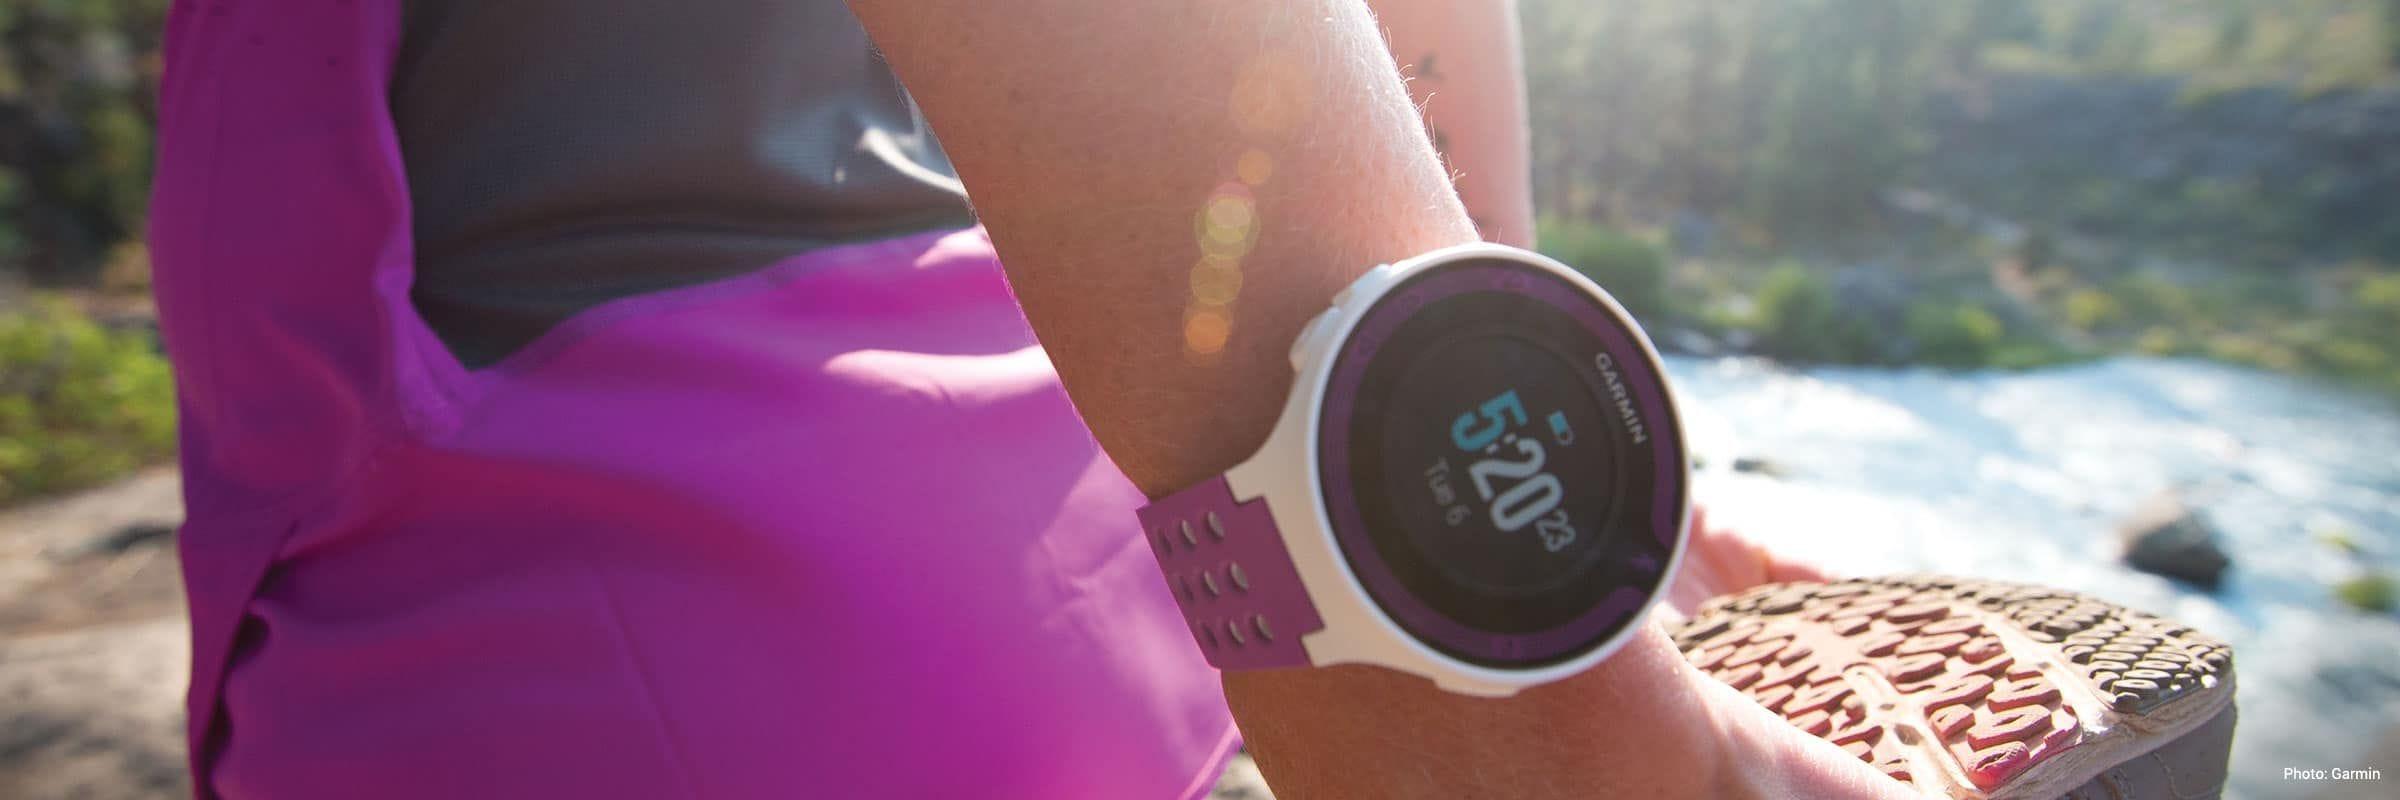 Garmin, Hiking & Trekking, Polar, Running, Ski & Snowboard, Suunto, tomtom. How to Choose the Right GPS Watch